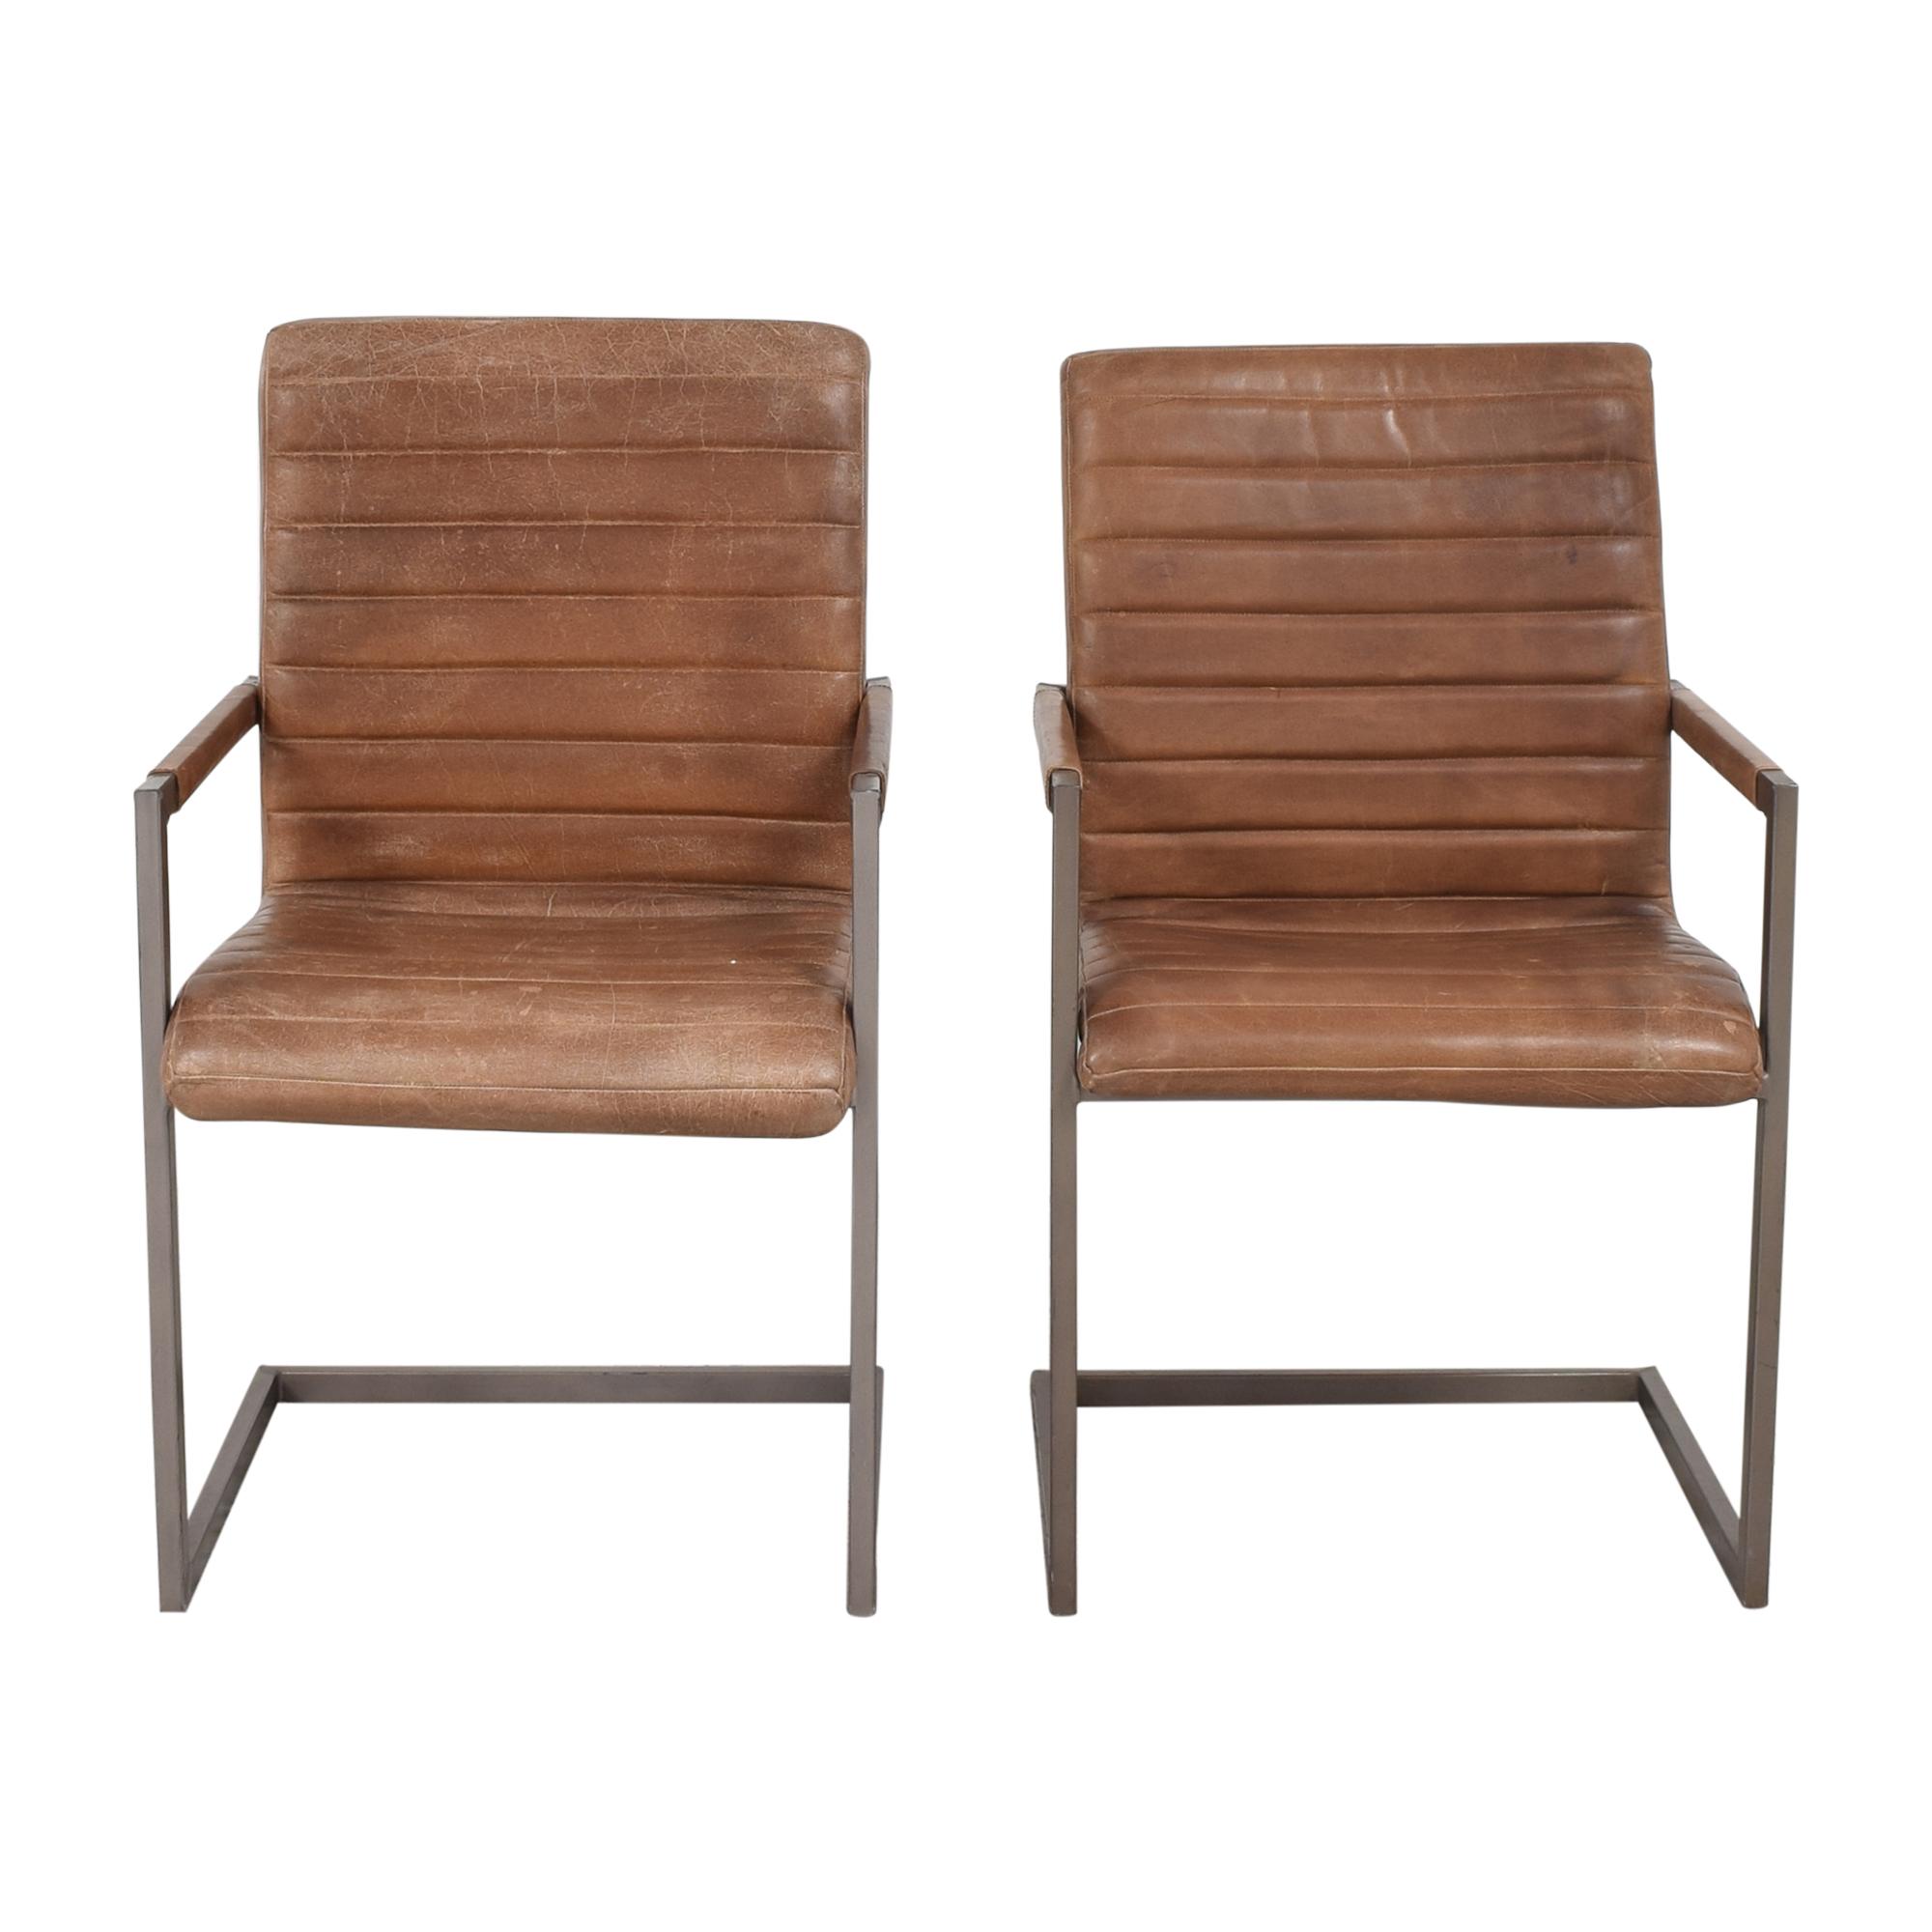 Pottery Barn Sabina Chairs / Dining Chairs